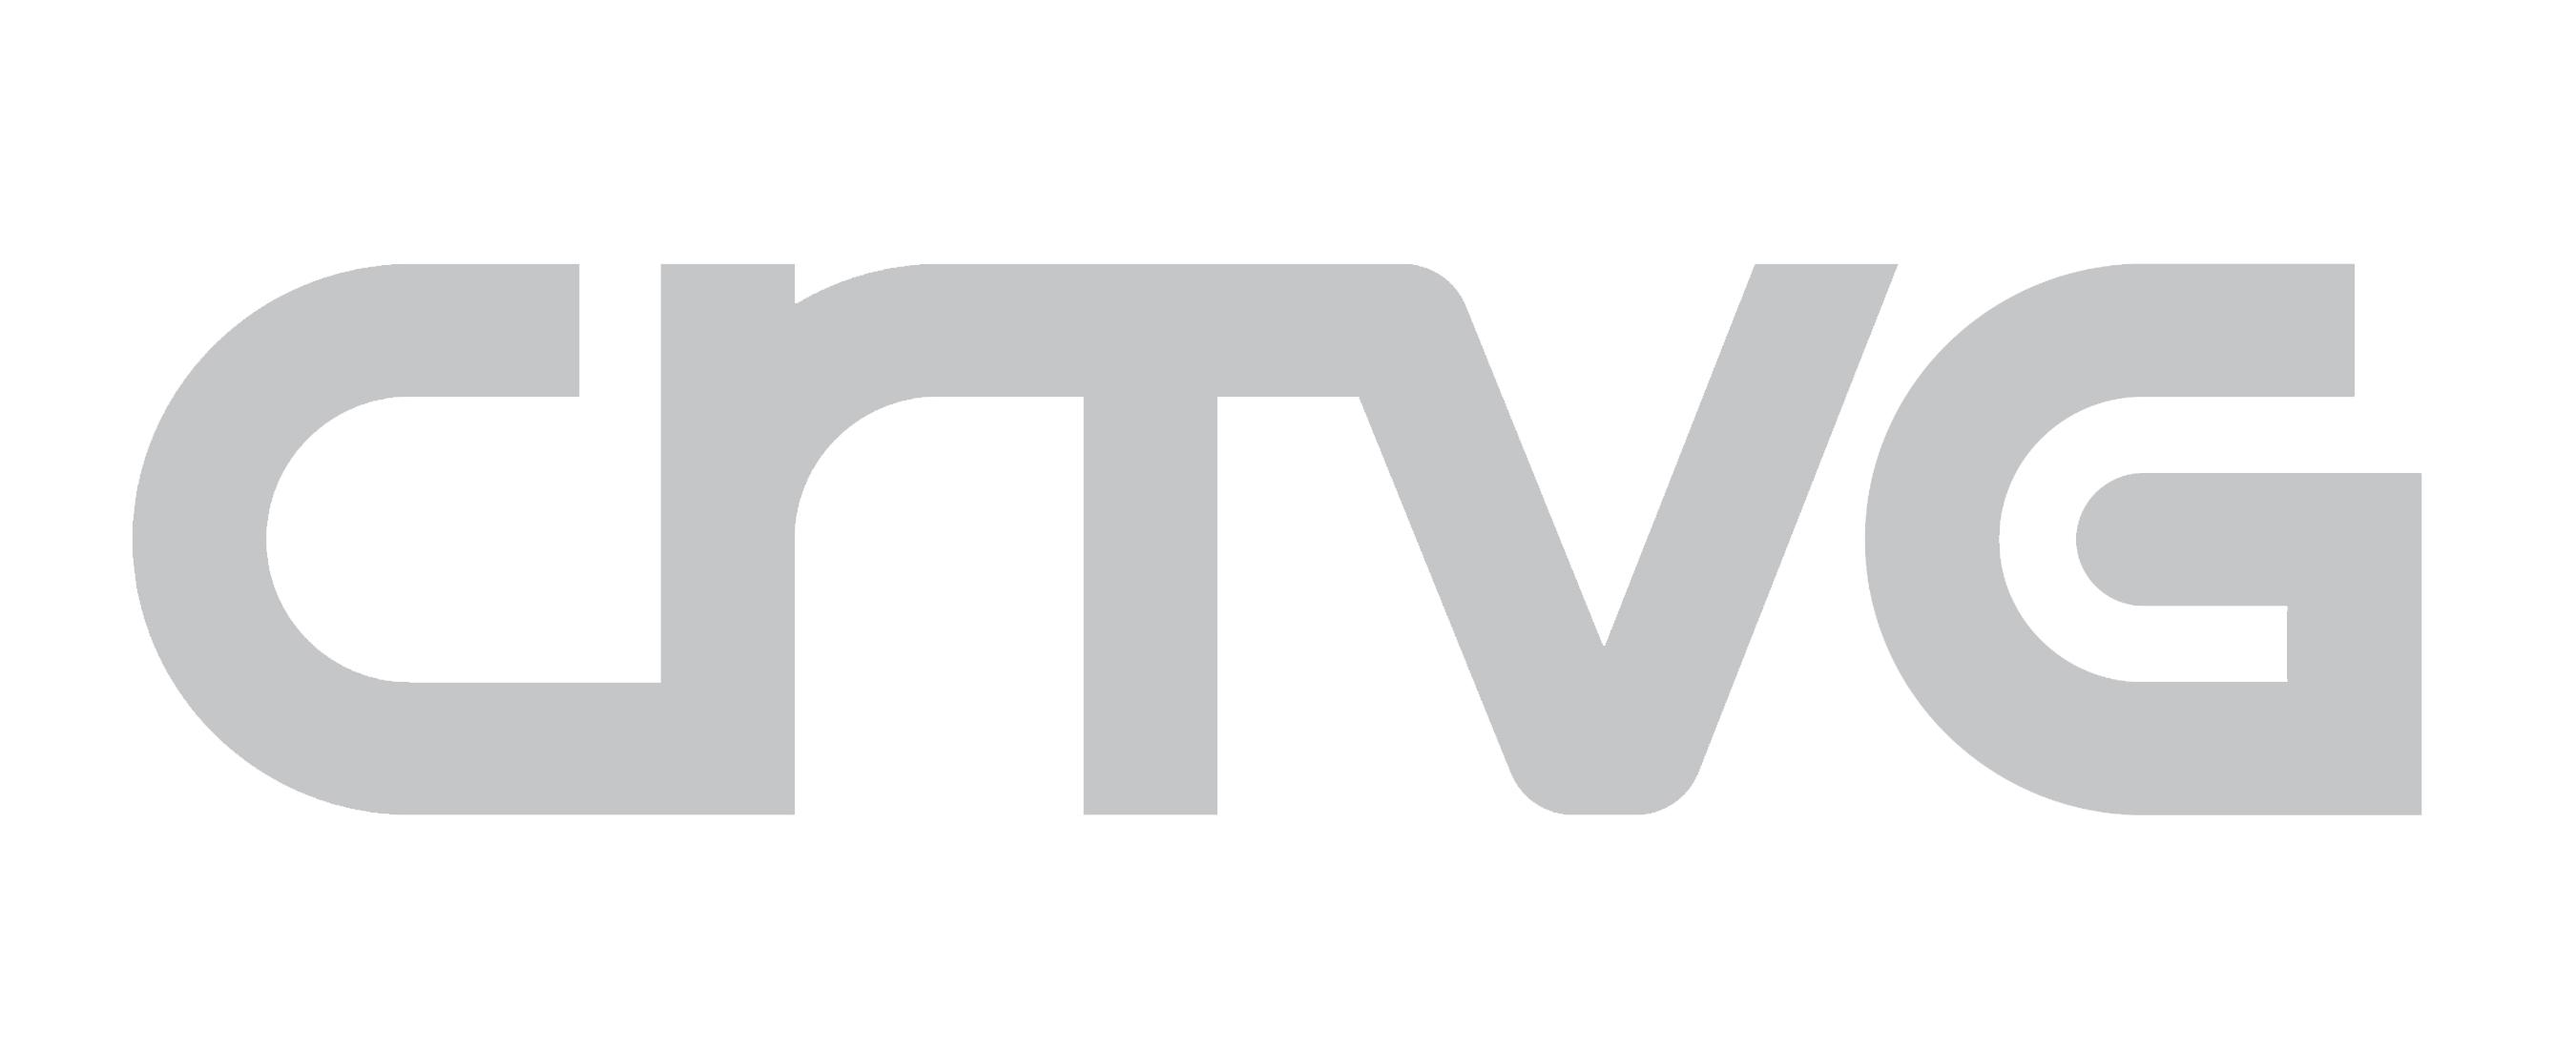 Logotipo CRTVG